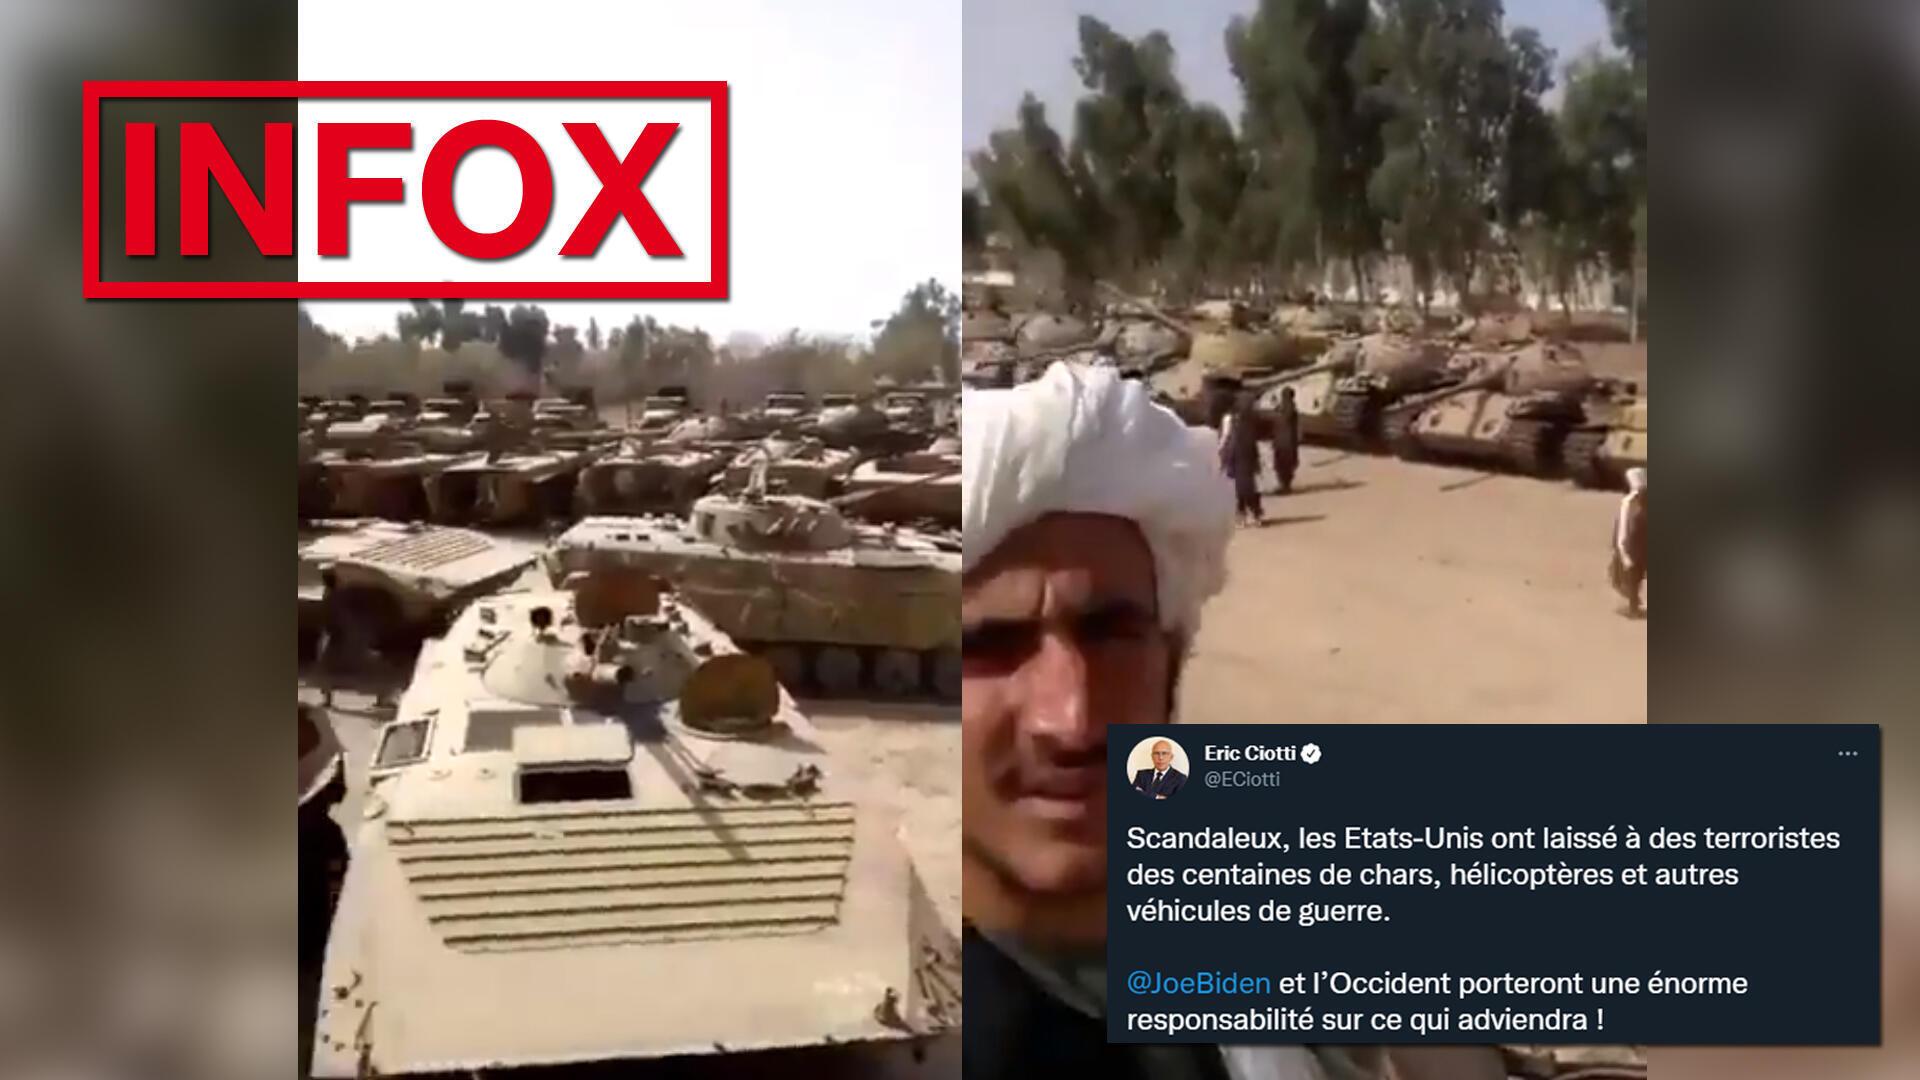 infox-eric-ciotti-afghanistan-talibans